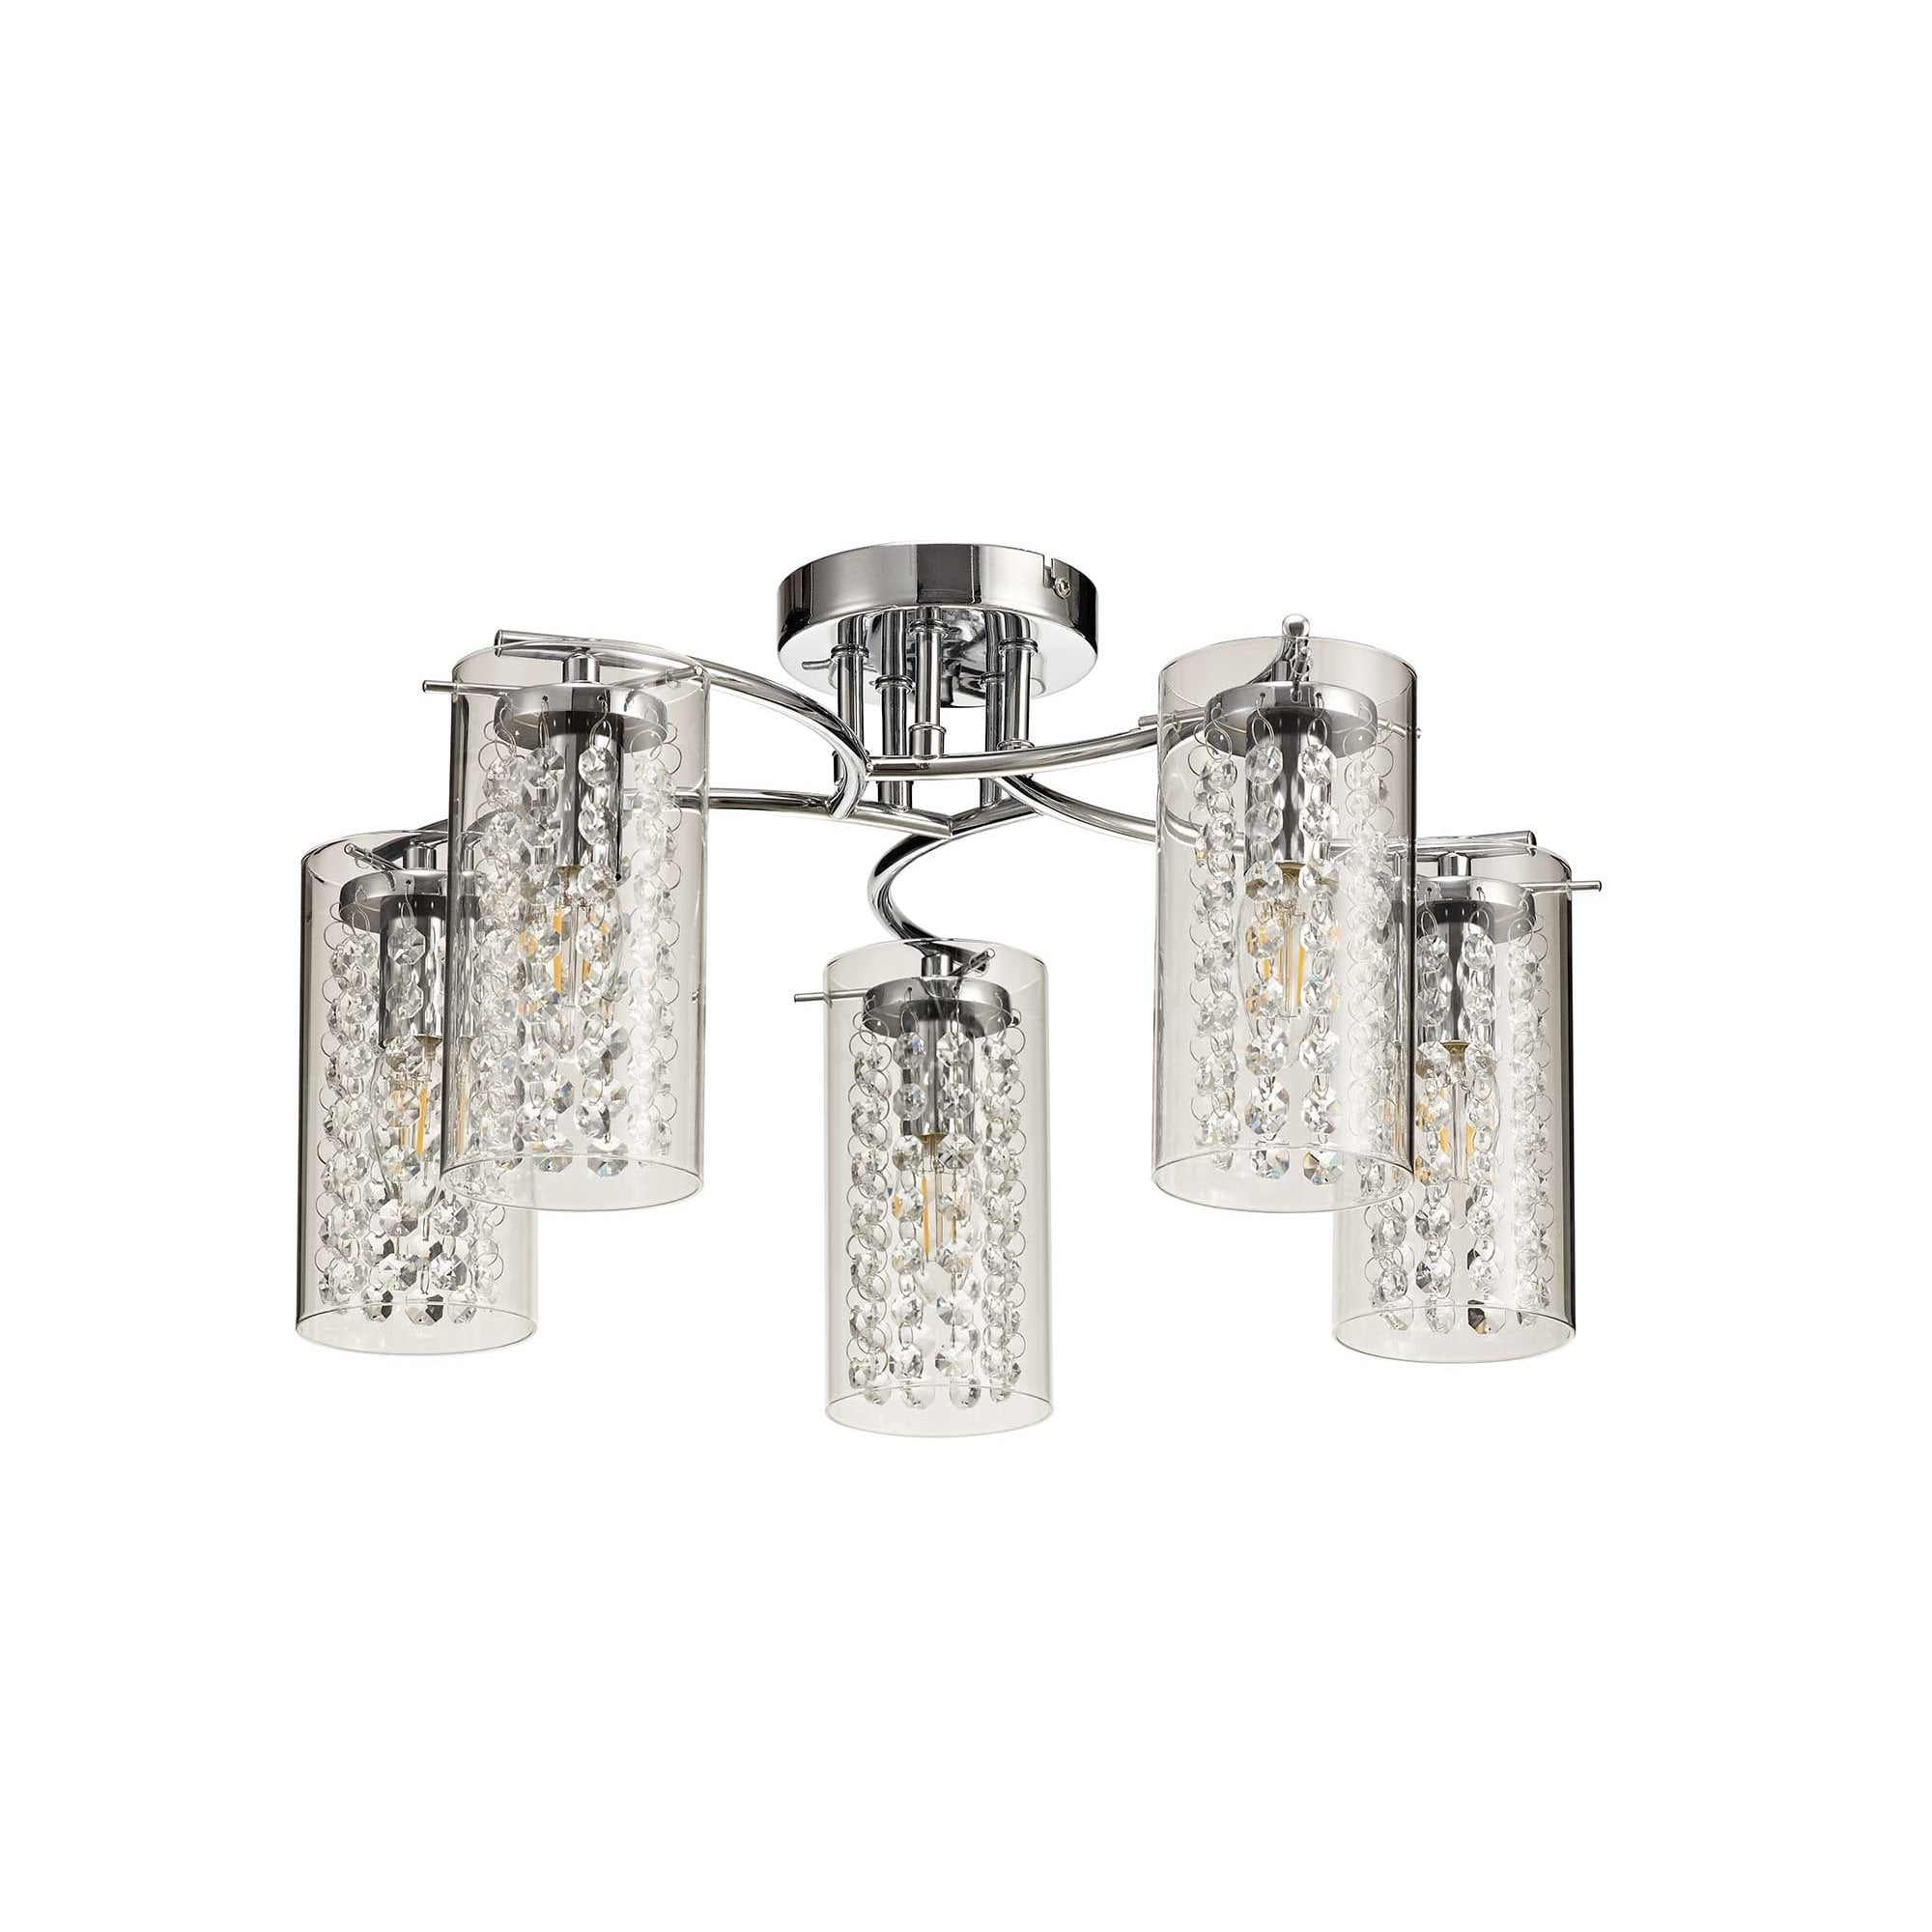 5 Light Modern Semi Flush Ceiling Light In Chrome With Crystal Glass